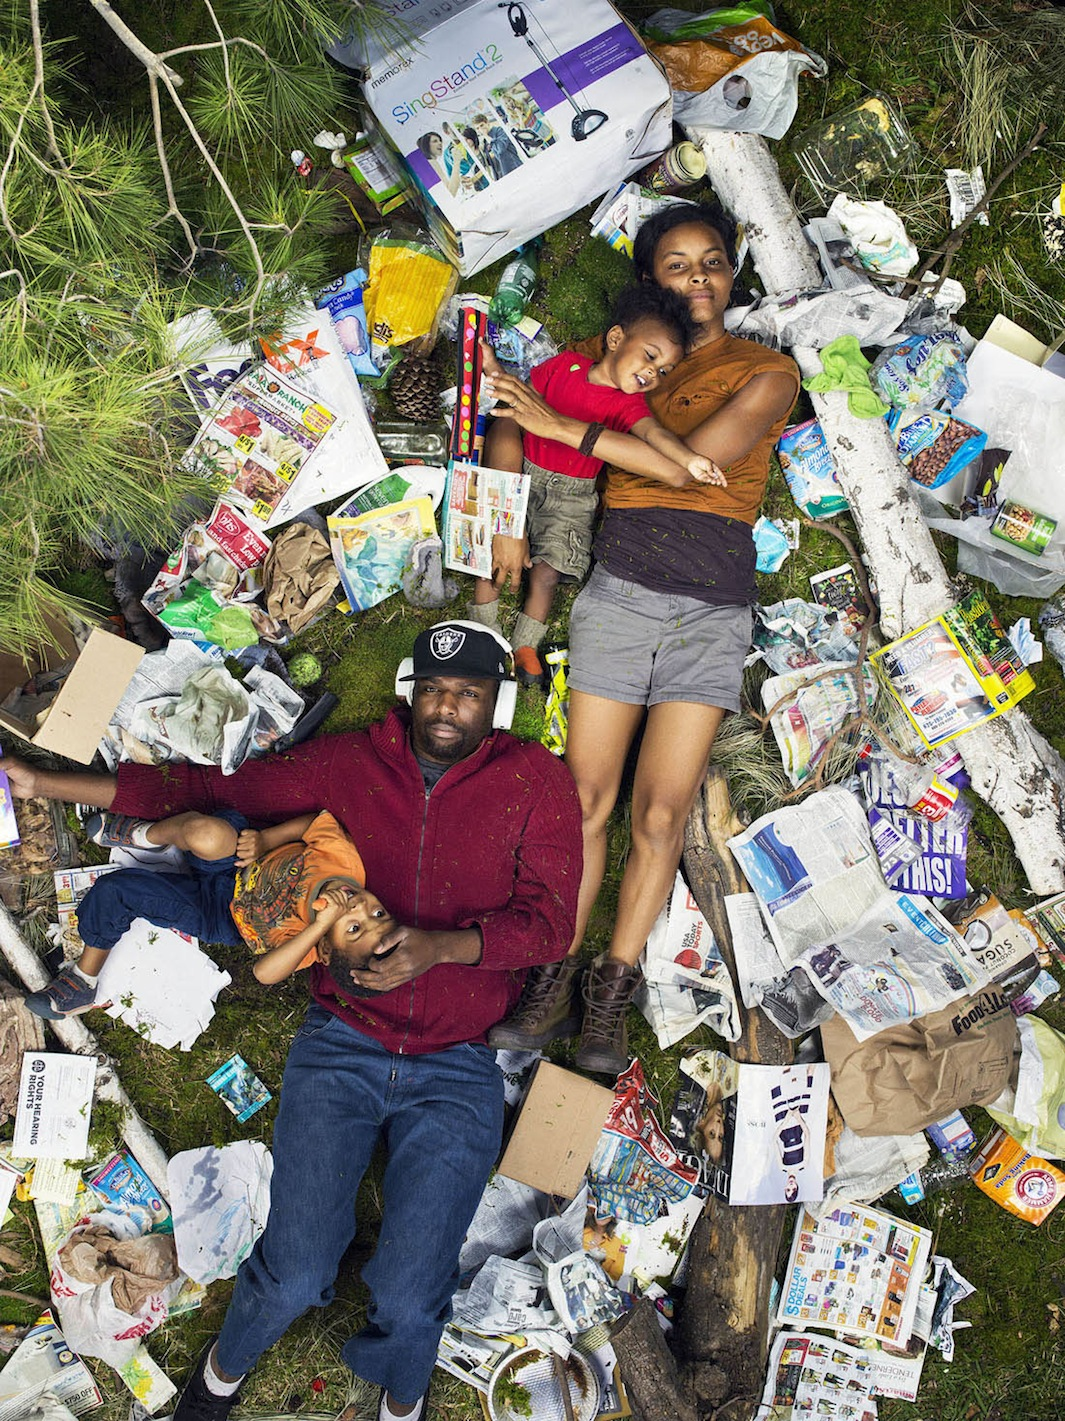 11_7 Days of Garbage_Ha#9C3688